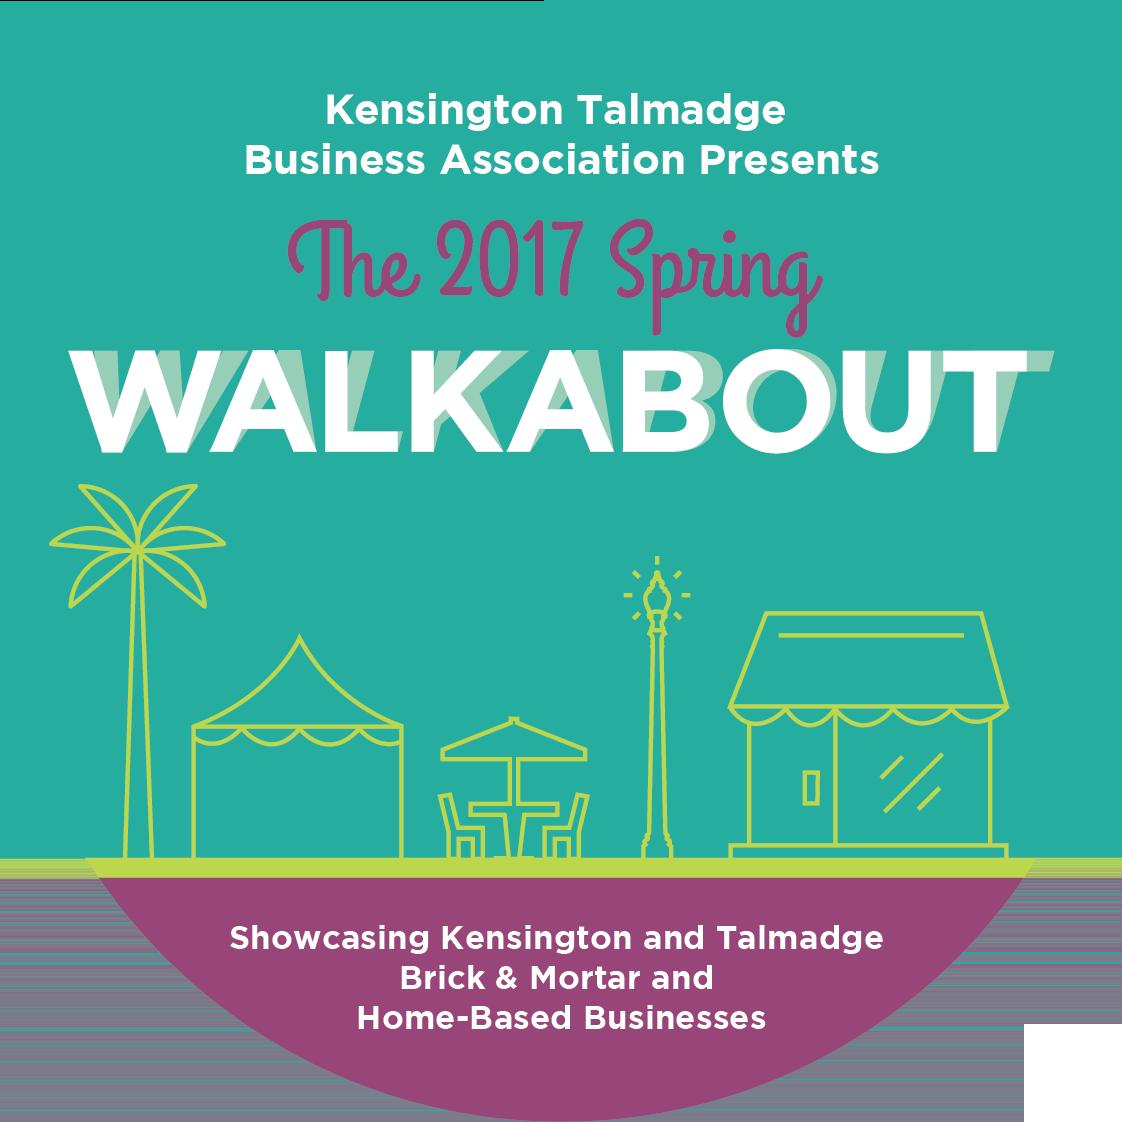 walkabout-logo1